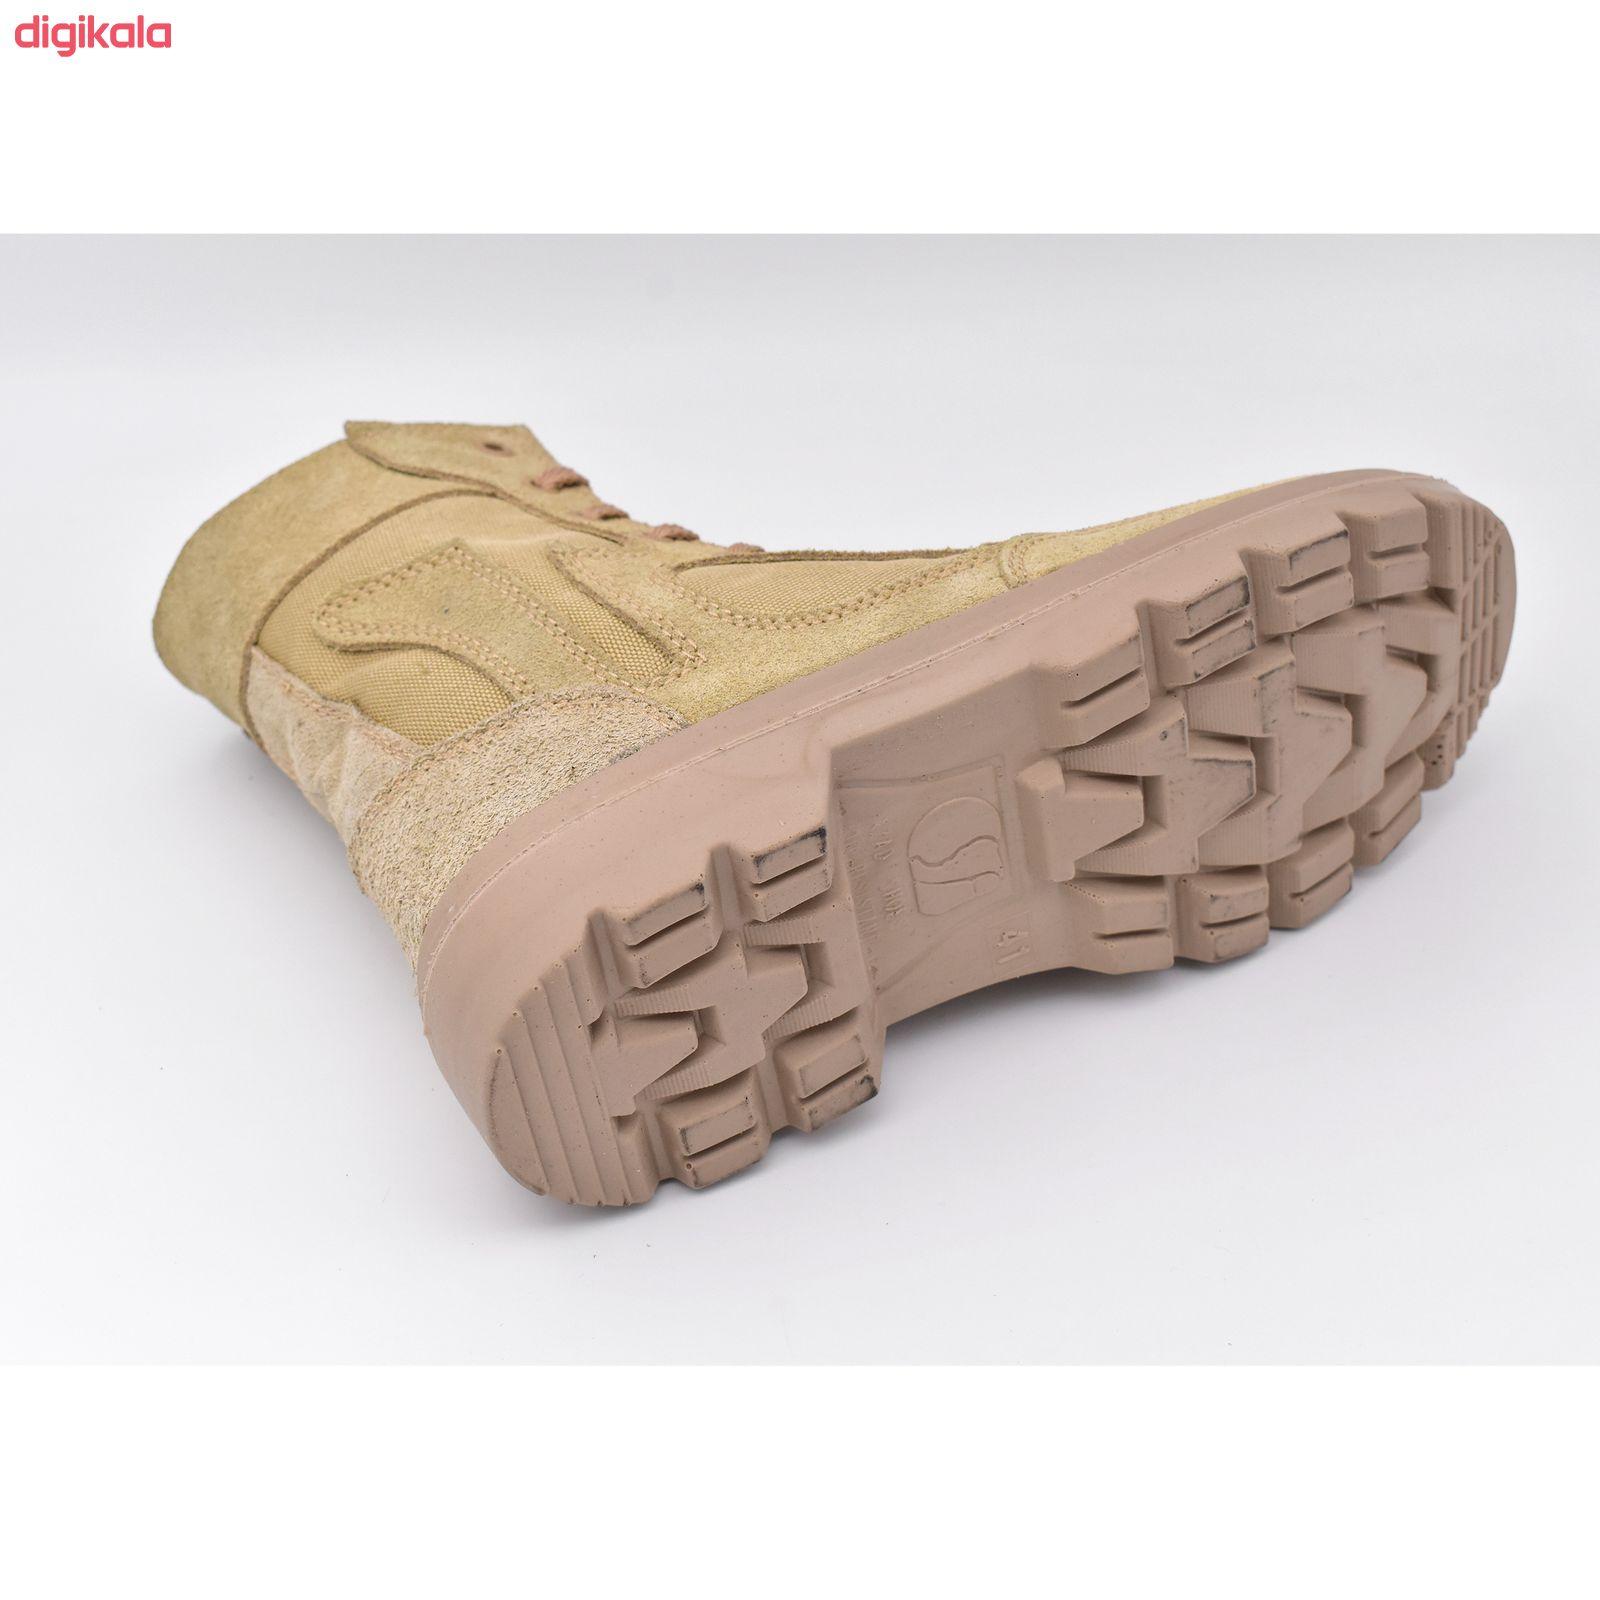 کفش کوهنوردی مردانه مدل Razm کد 8485 main 1 11